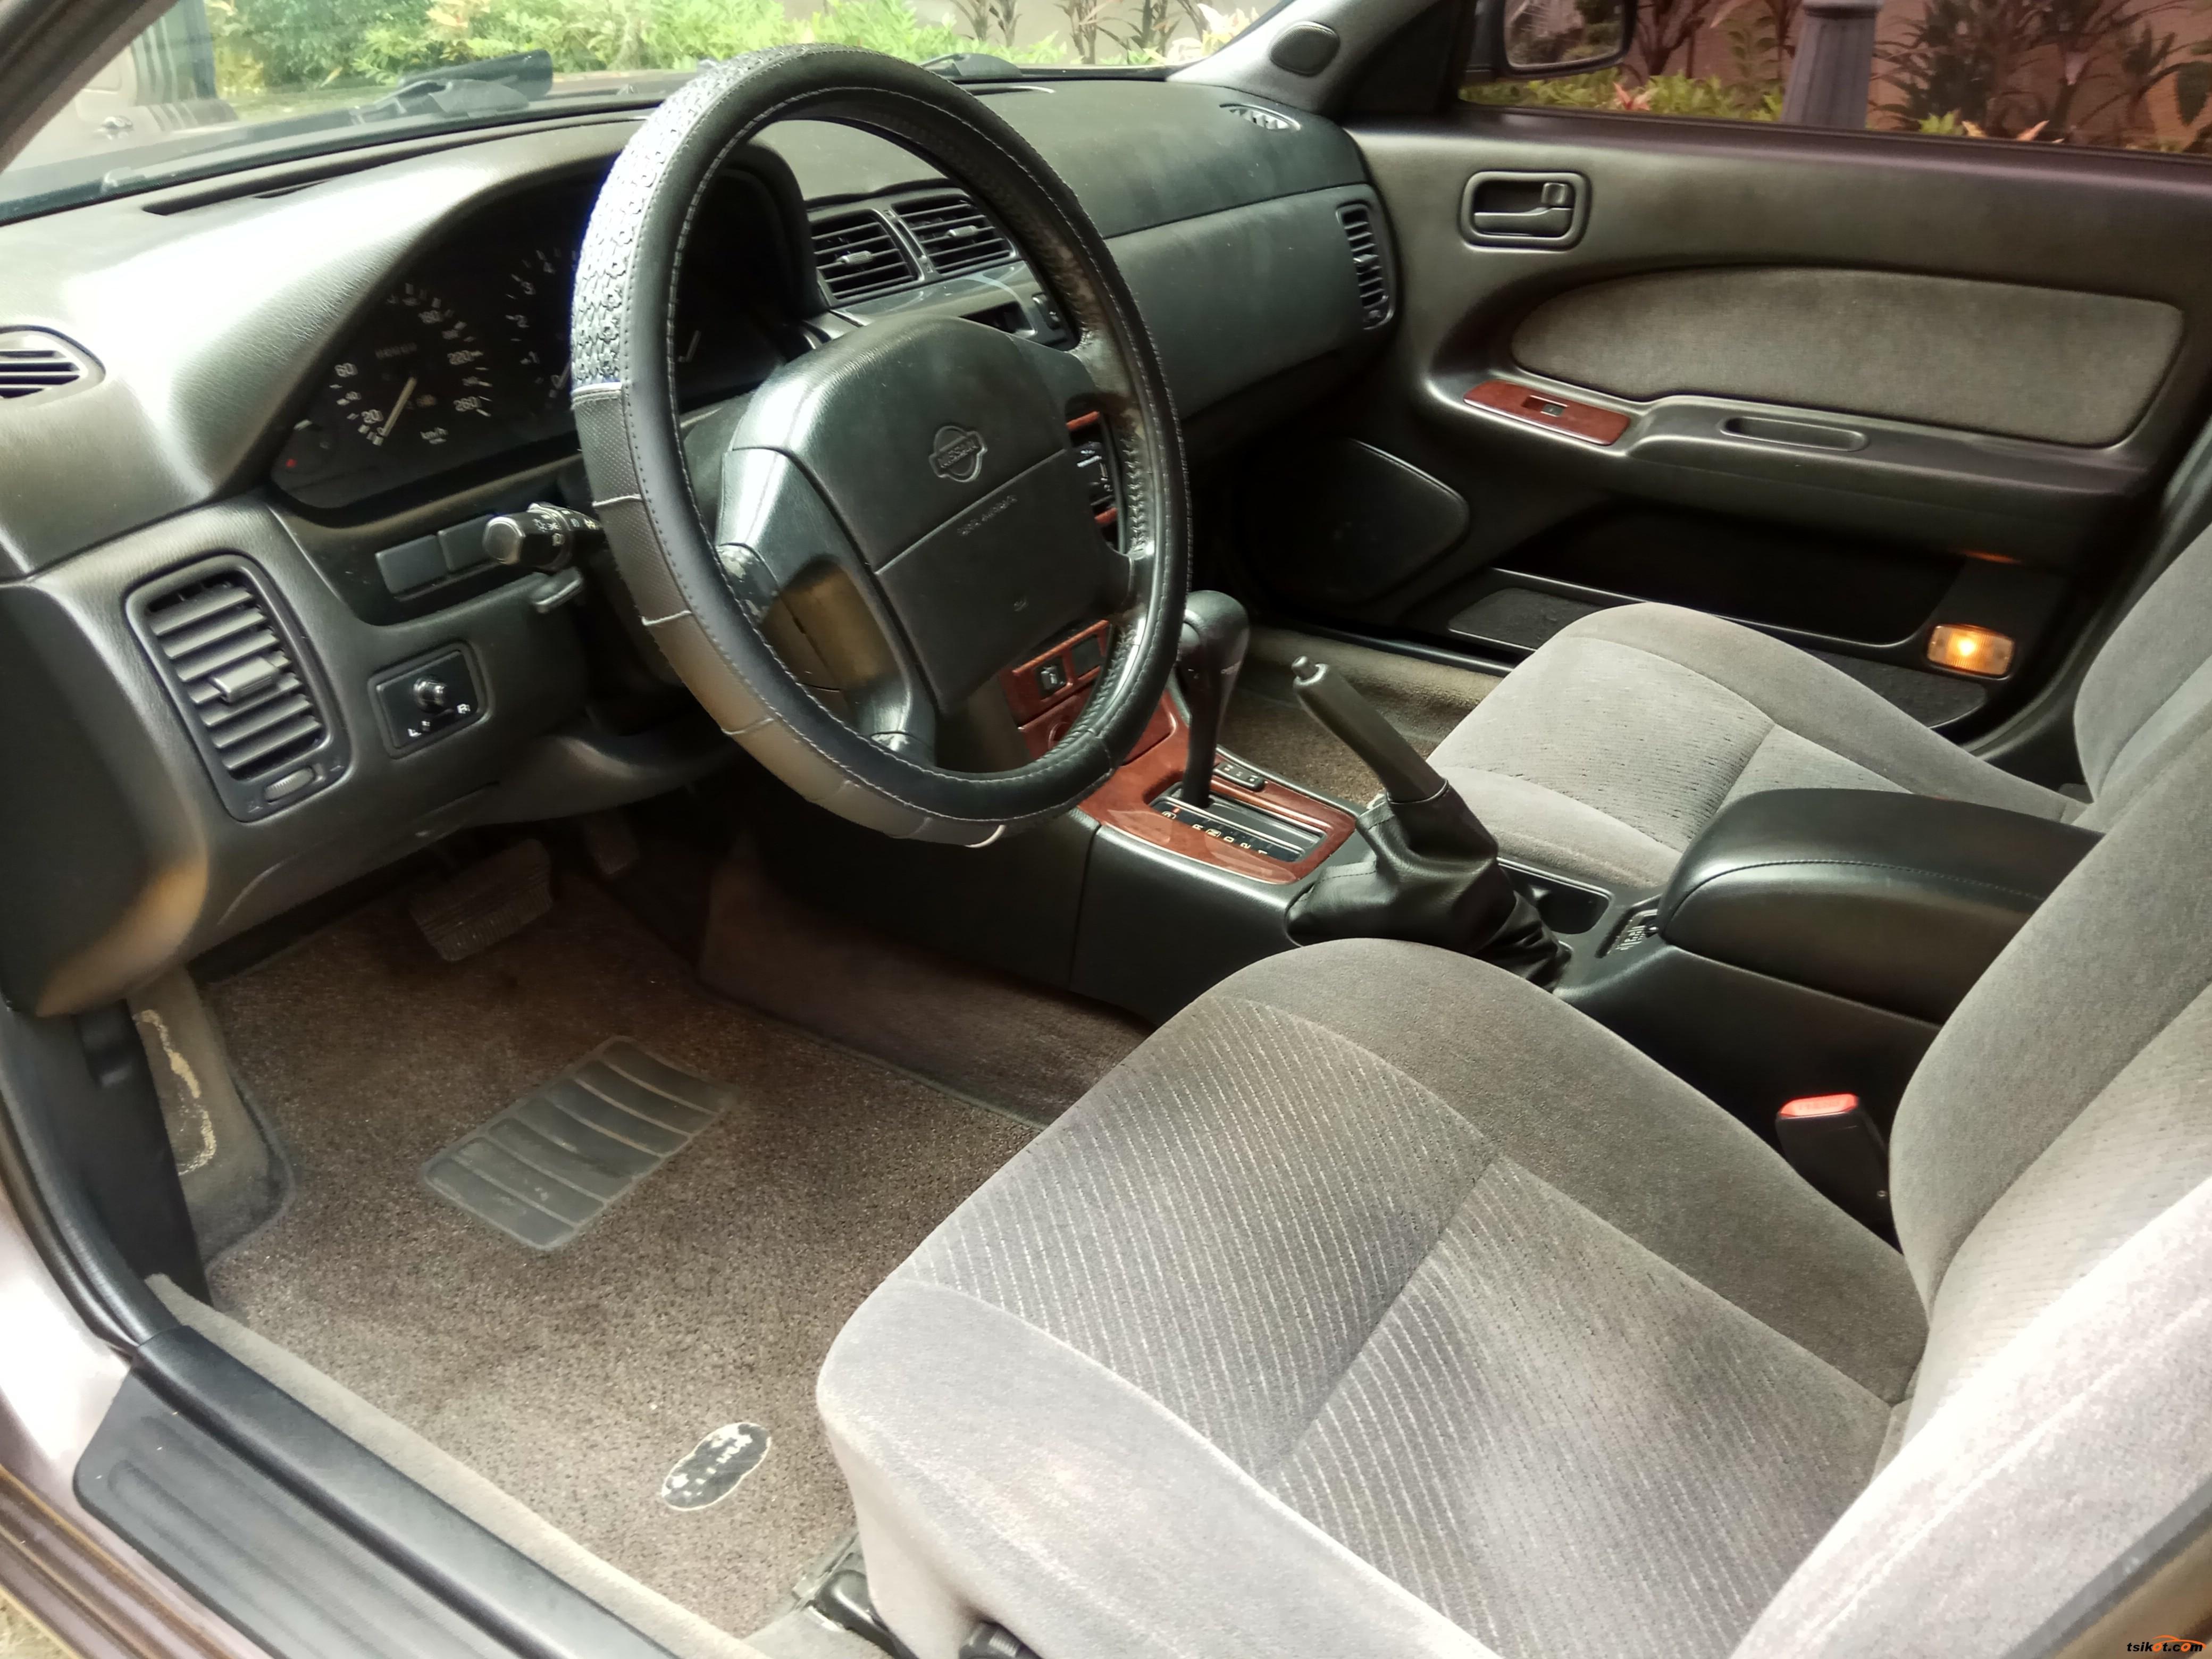 Nissan Cefiro 1997 - 7